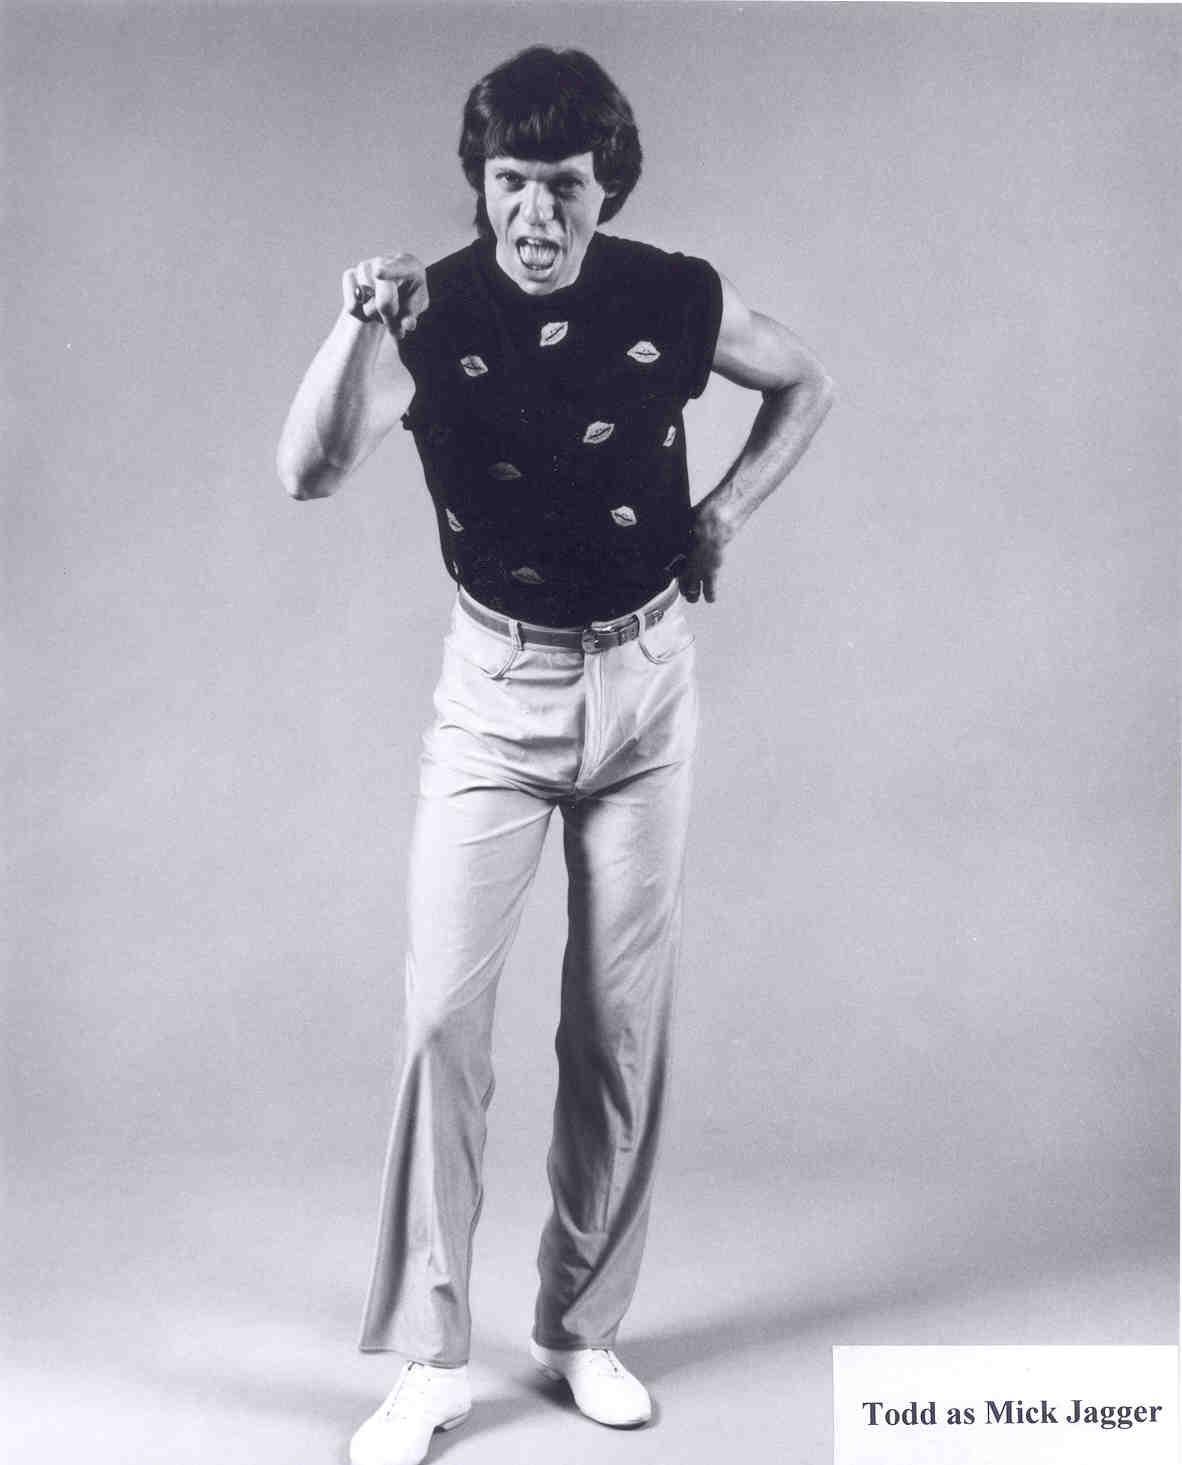 JaggerMick Toddfullbody - Mick Jagger